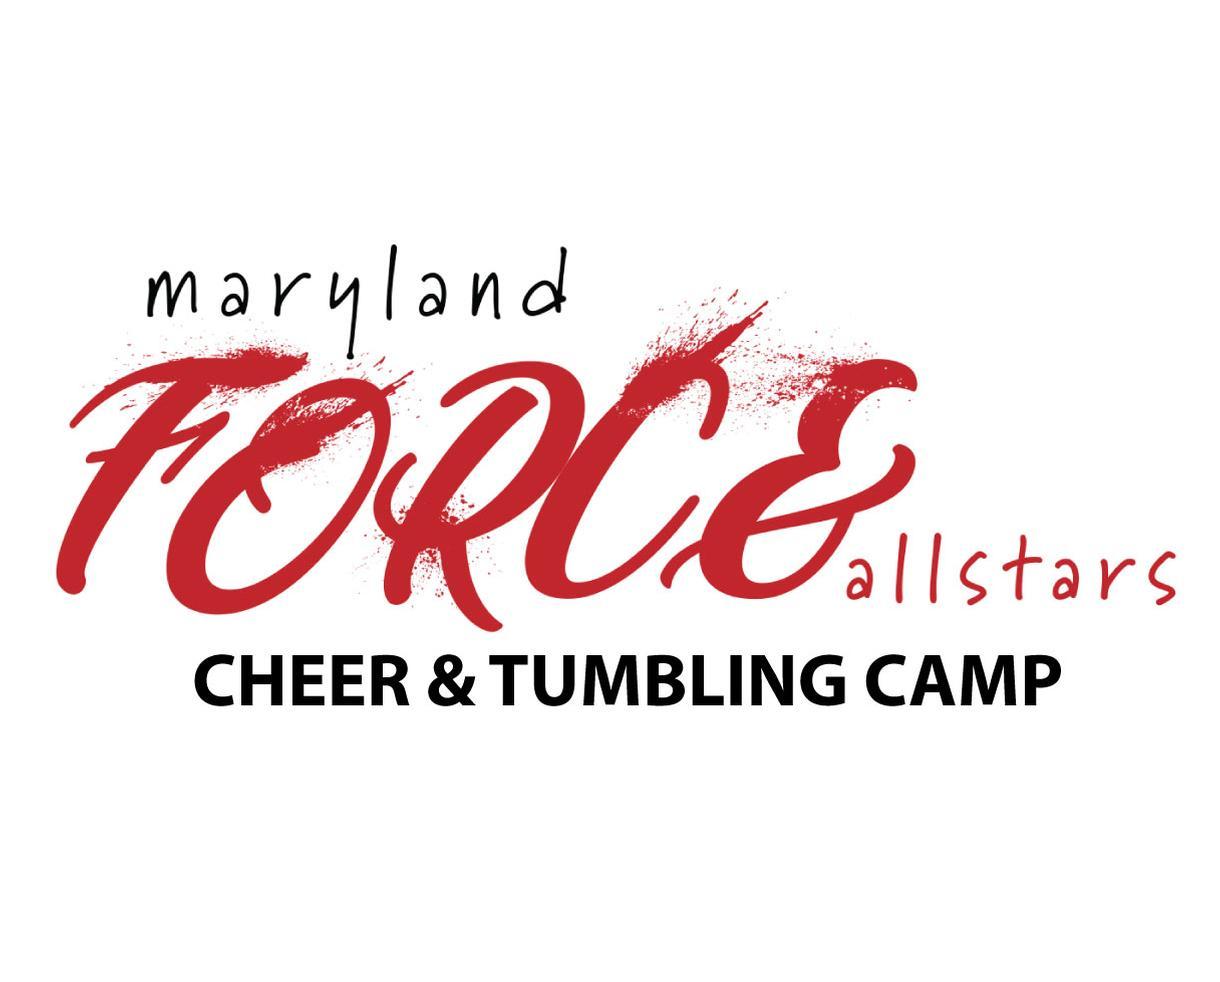 Maryland Force Allstars Cheer Camp